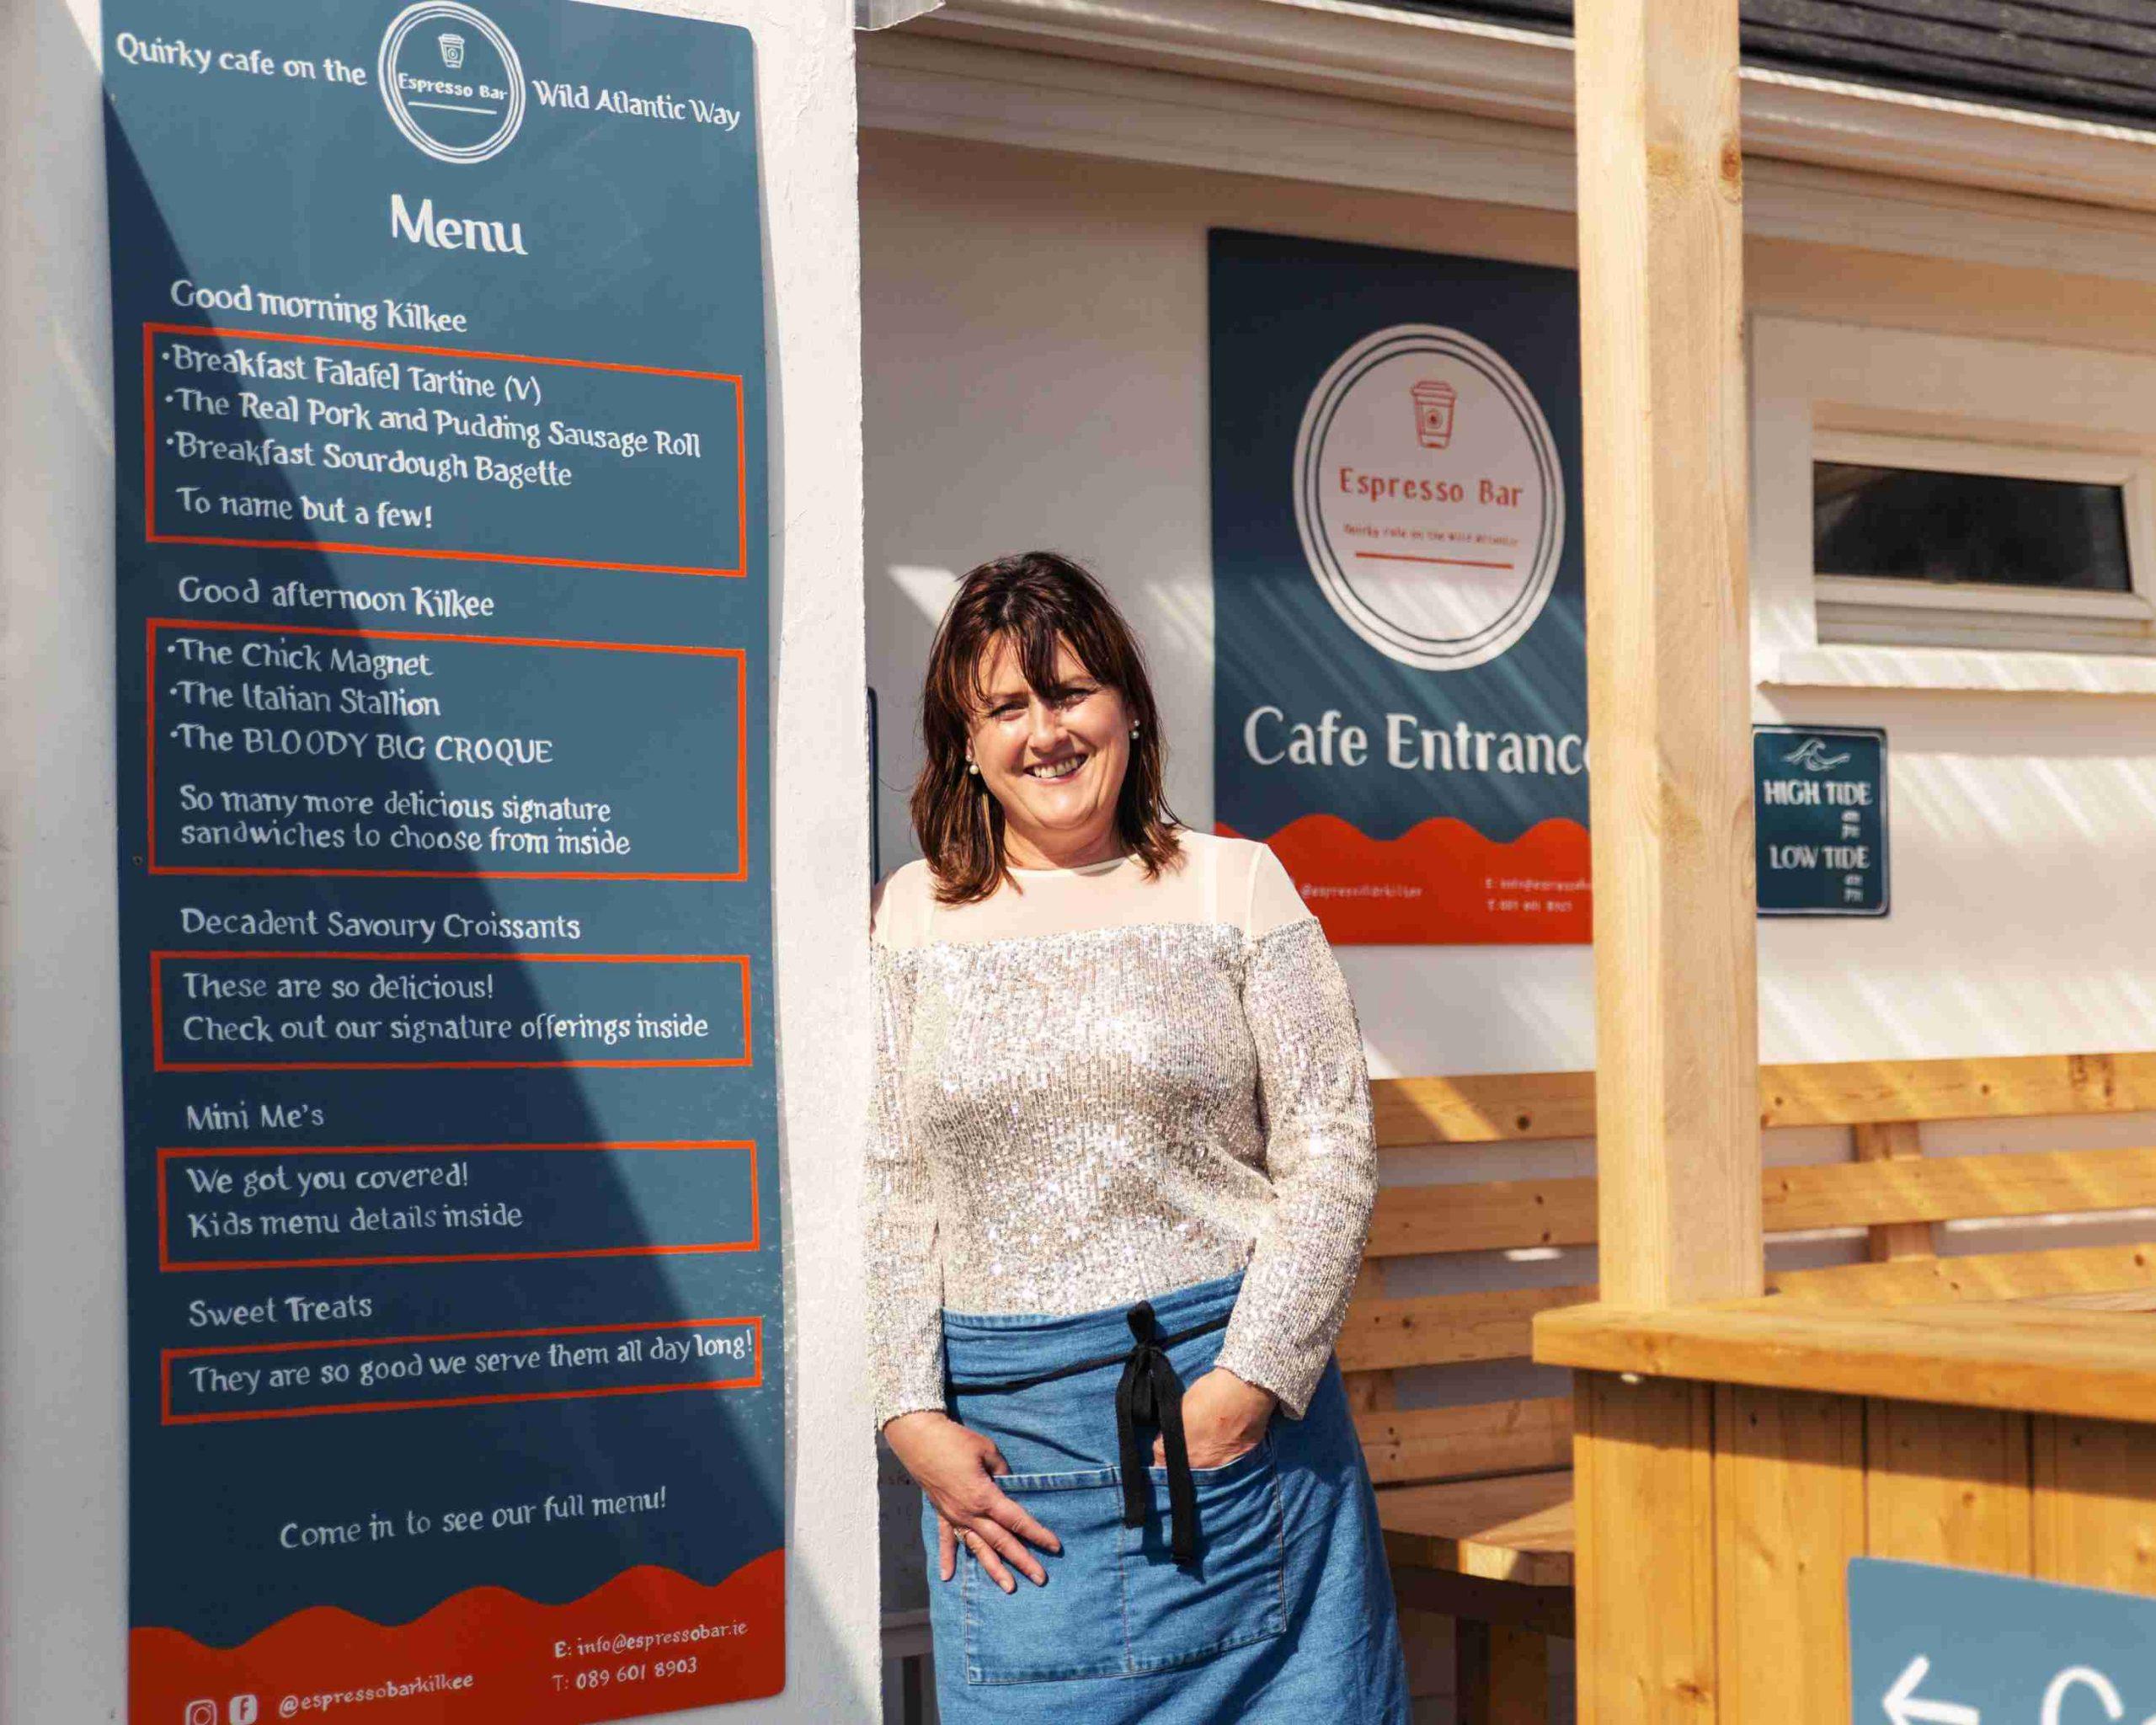 WOMEN OF THE IRISH FOOD INDUSTRY – JUDI KINNANE, CAFE OWNER